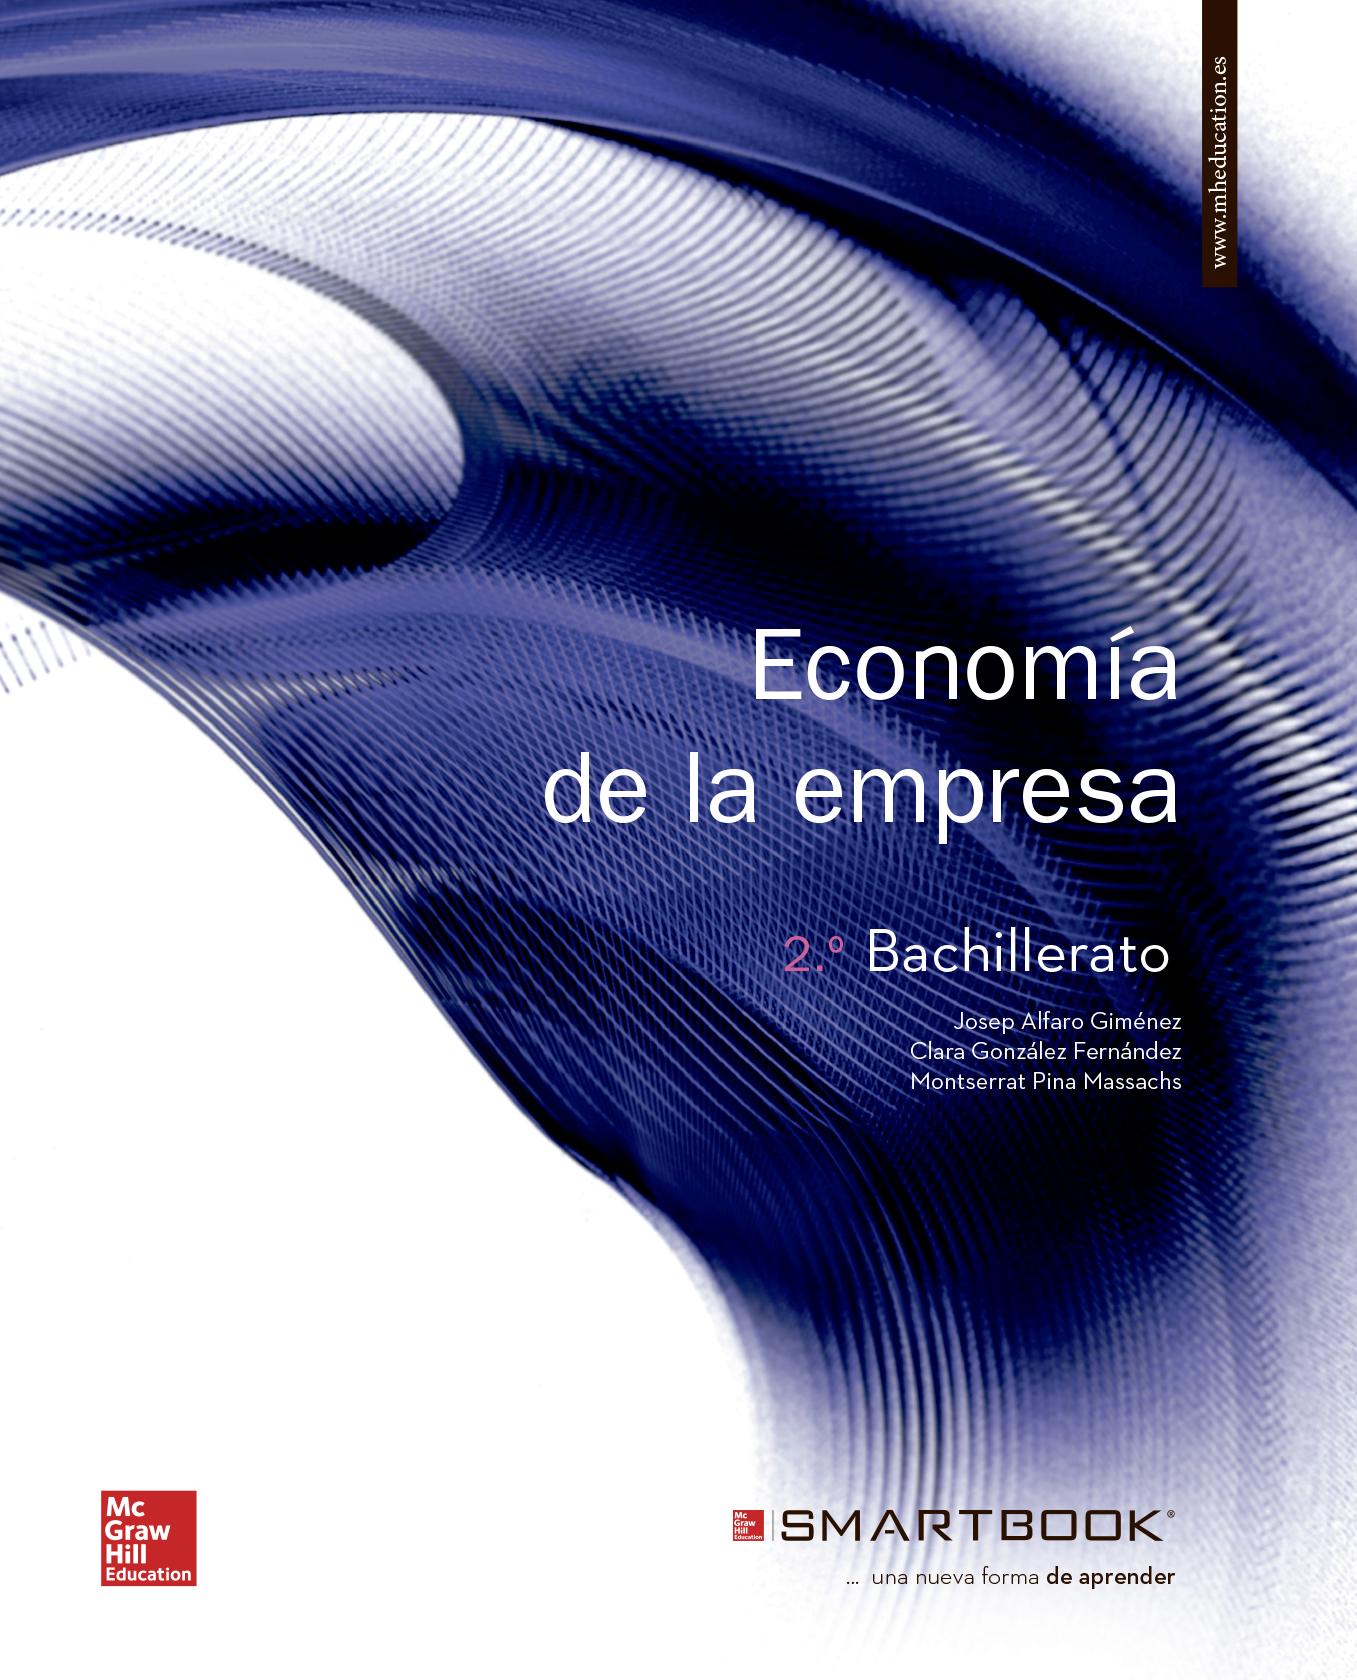 Economía de la Empresa 2 Bachillerato Mcgraw-Hill Soluciones 2020 / 2021